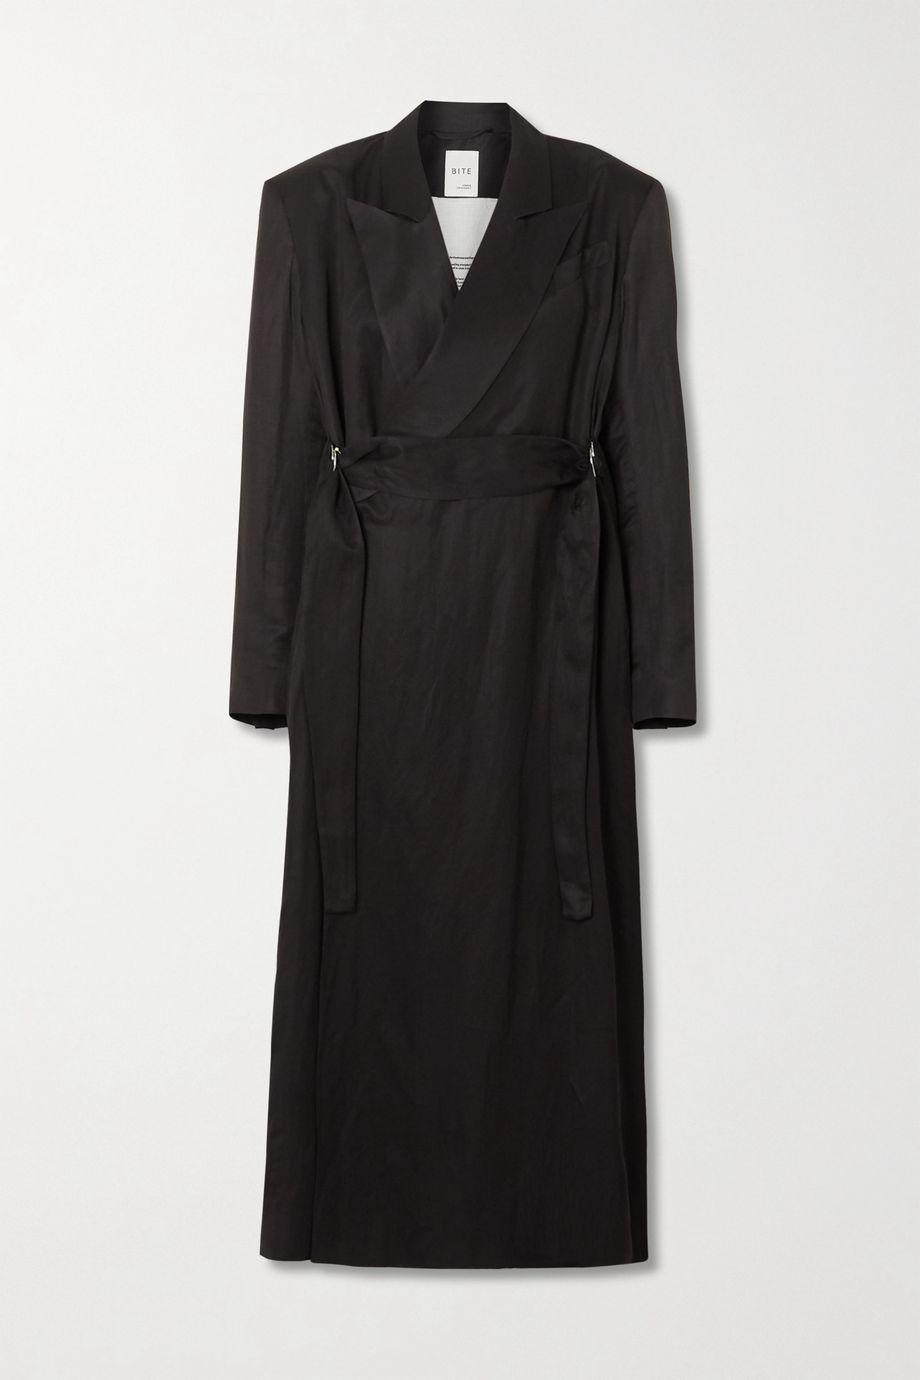 BITE Studios + NET SUSTAIN belted washed-satin coat